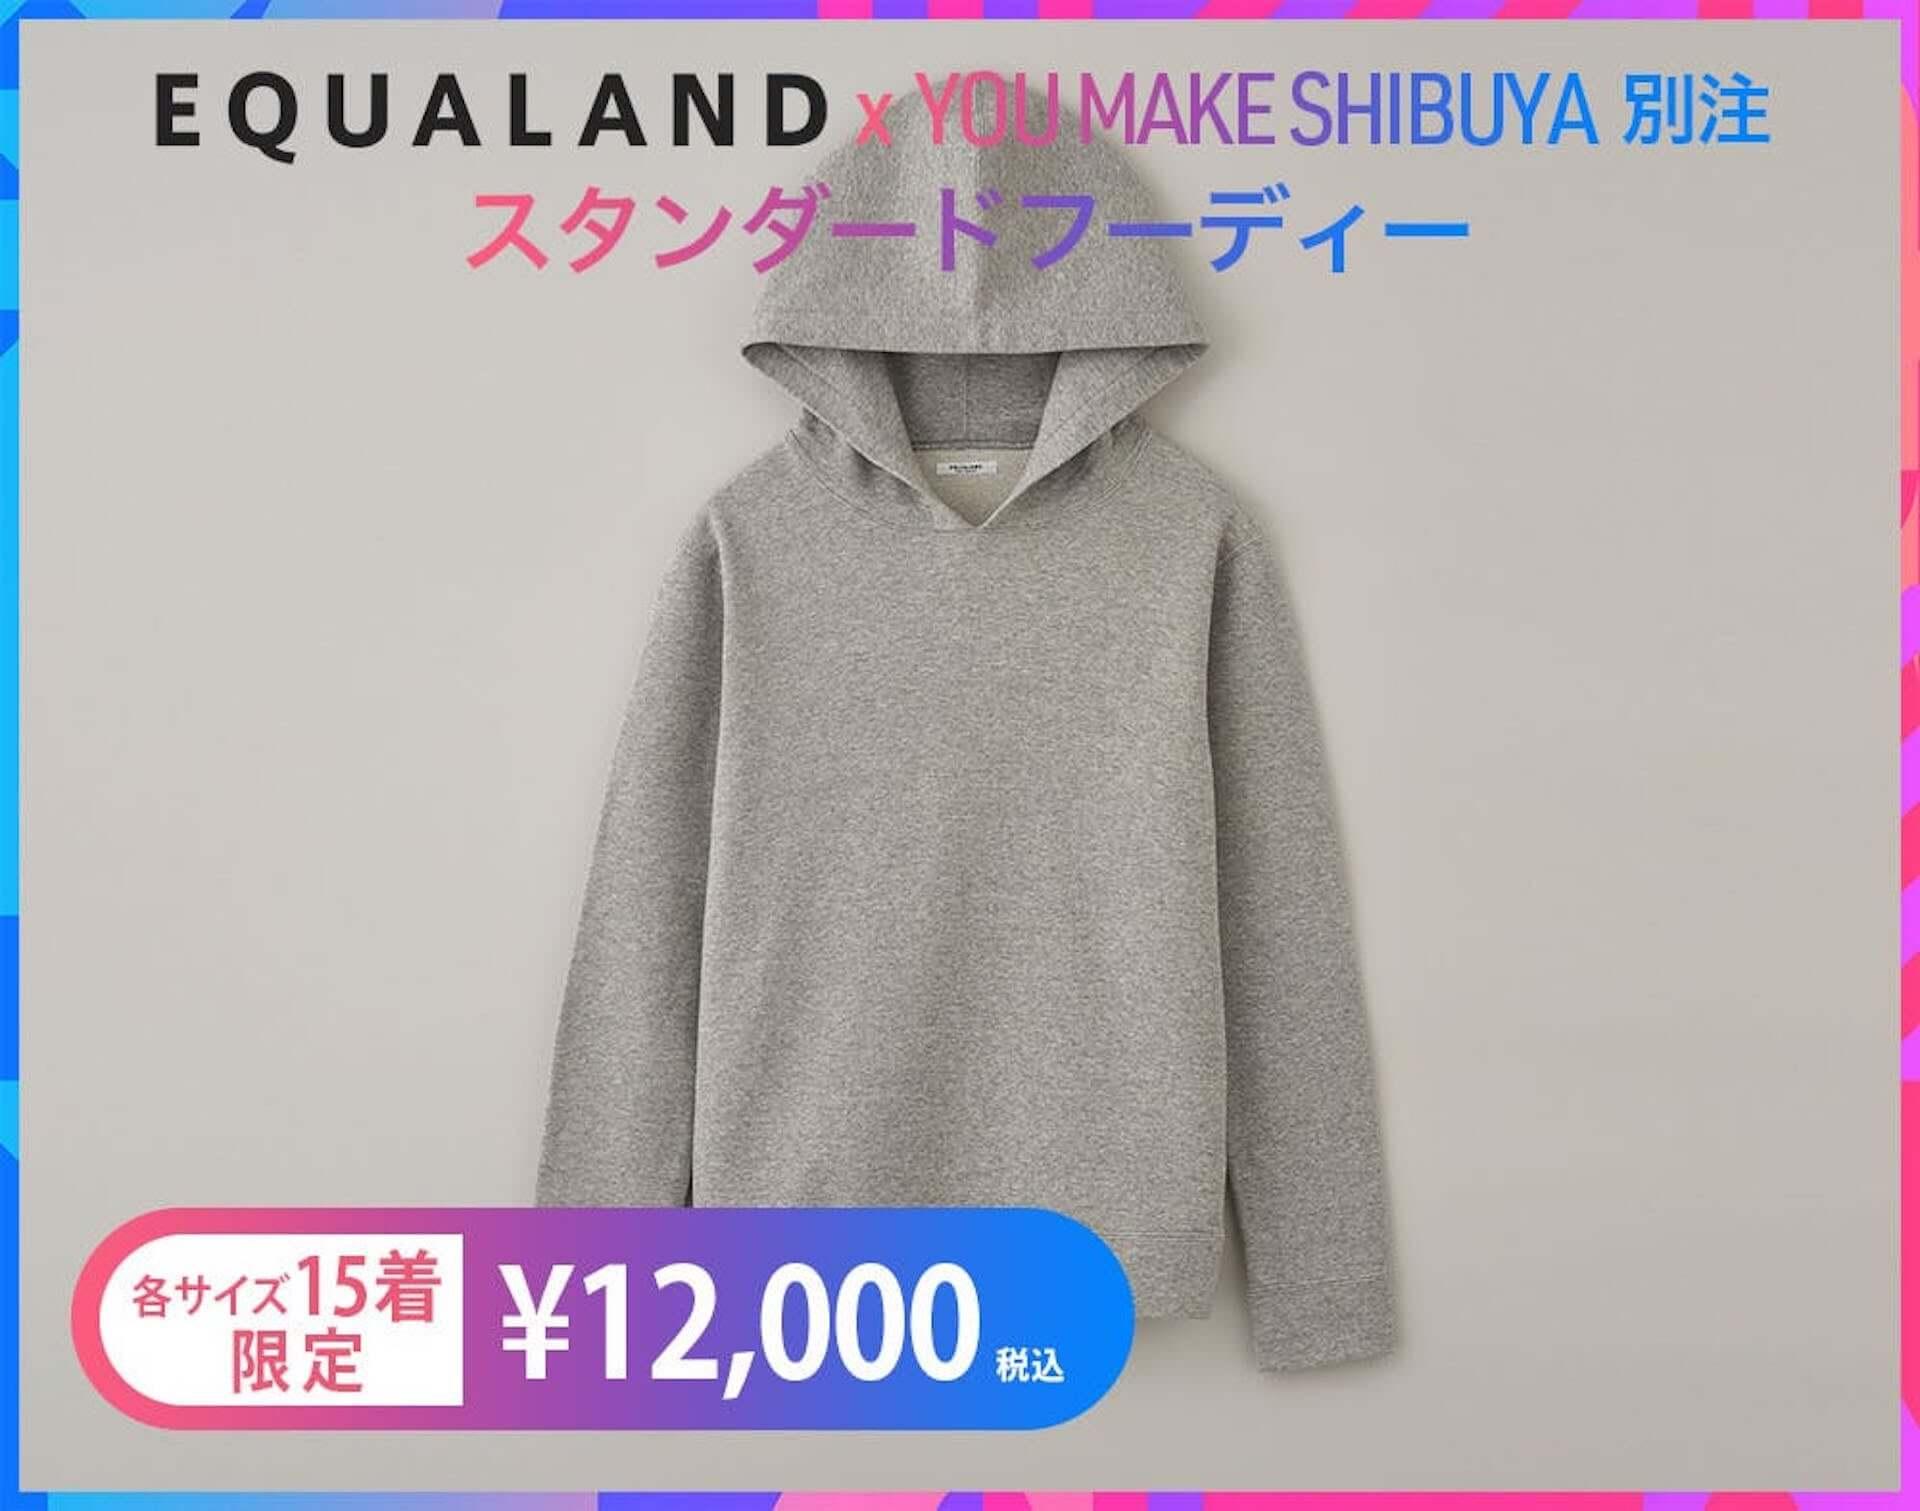 「YOU MAKE SHIBUYA クラウドファンディング」とKISS,TOKYO、atmos、EQUALAND、FR2がコラボ!リターンにTシャツ、フーディーなど多数登場 lf200805_youmakeshibuya_2-1920x1511